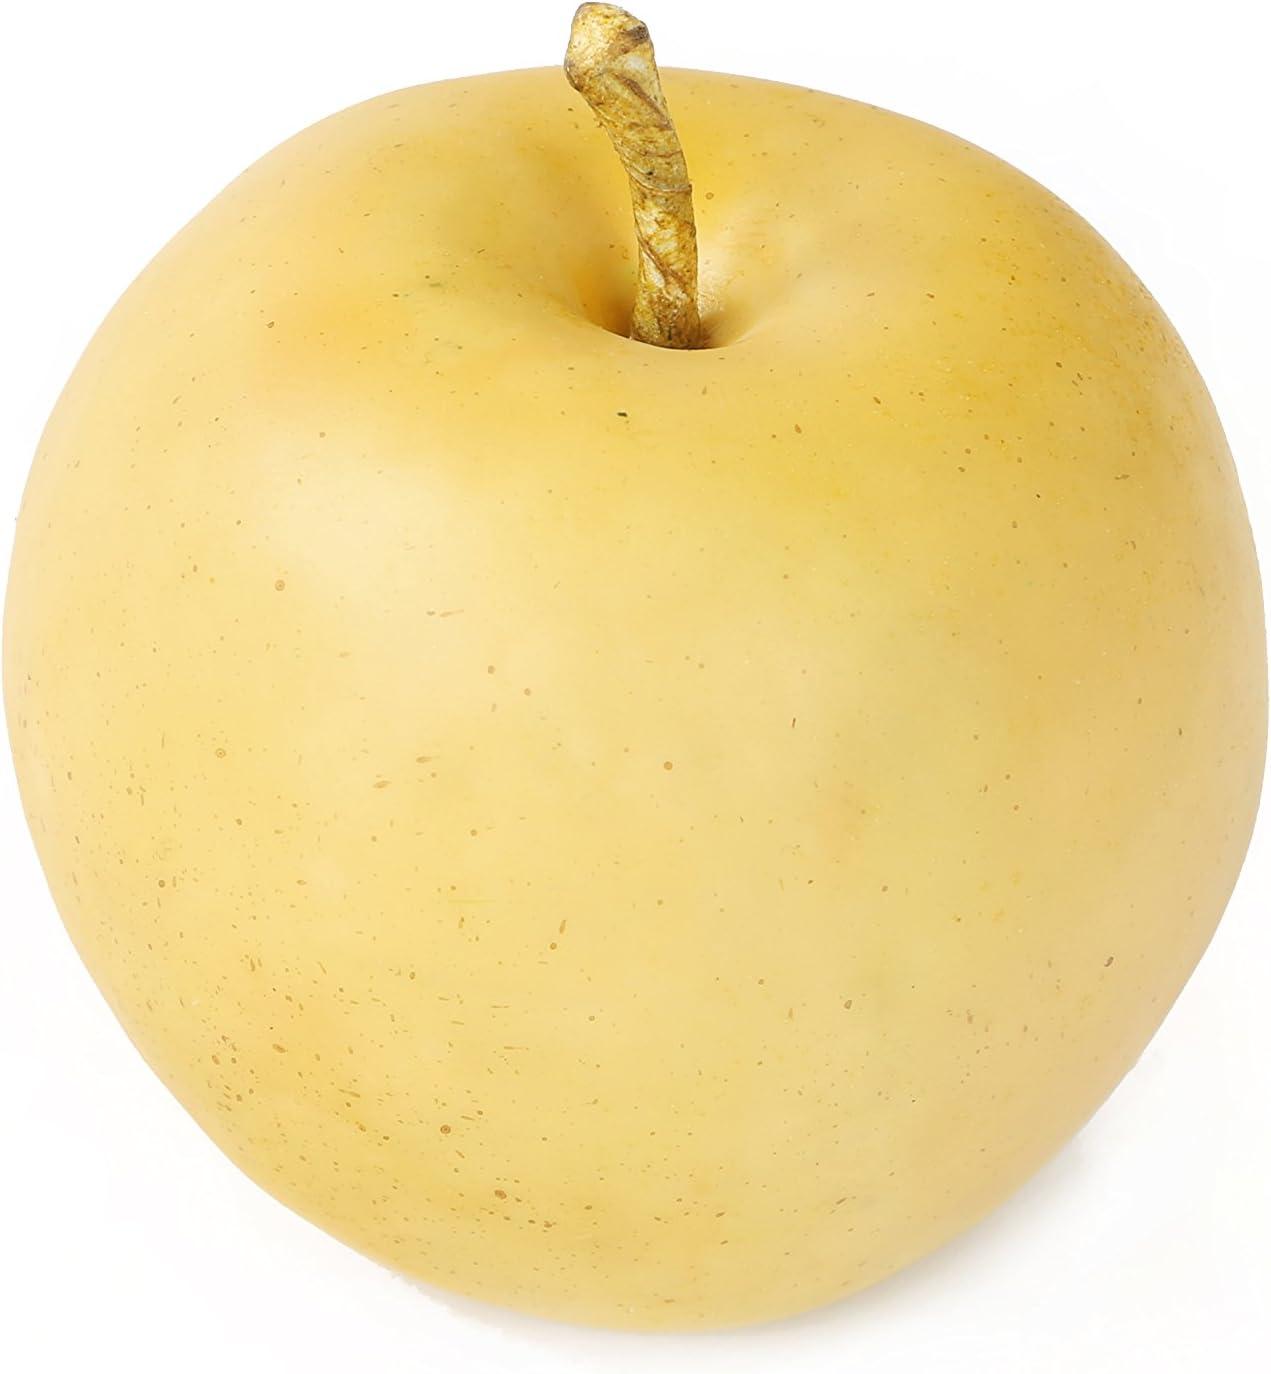 Mecanismo To Nature Golden Delicious Apple